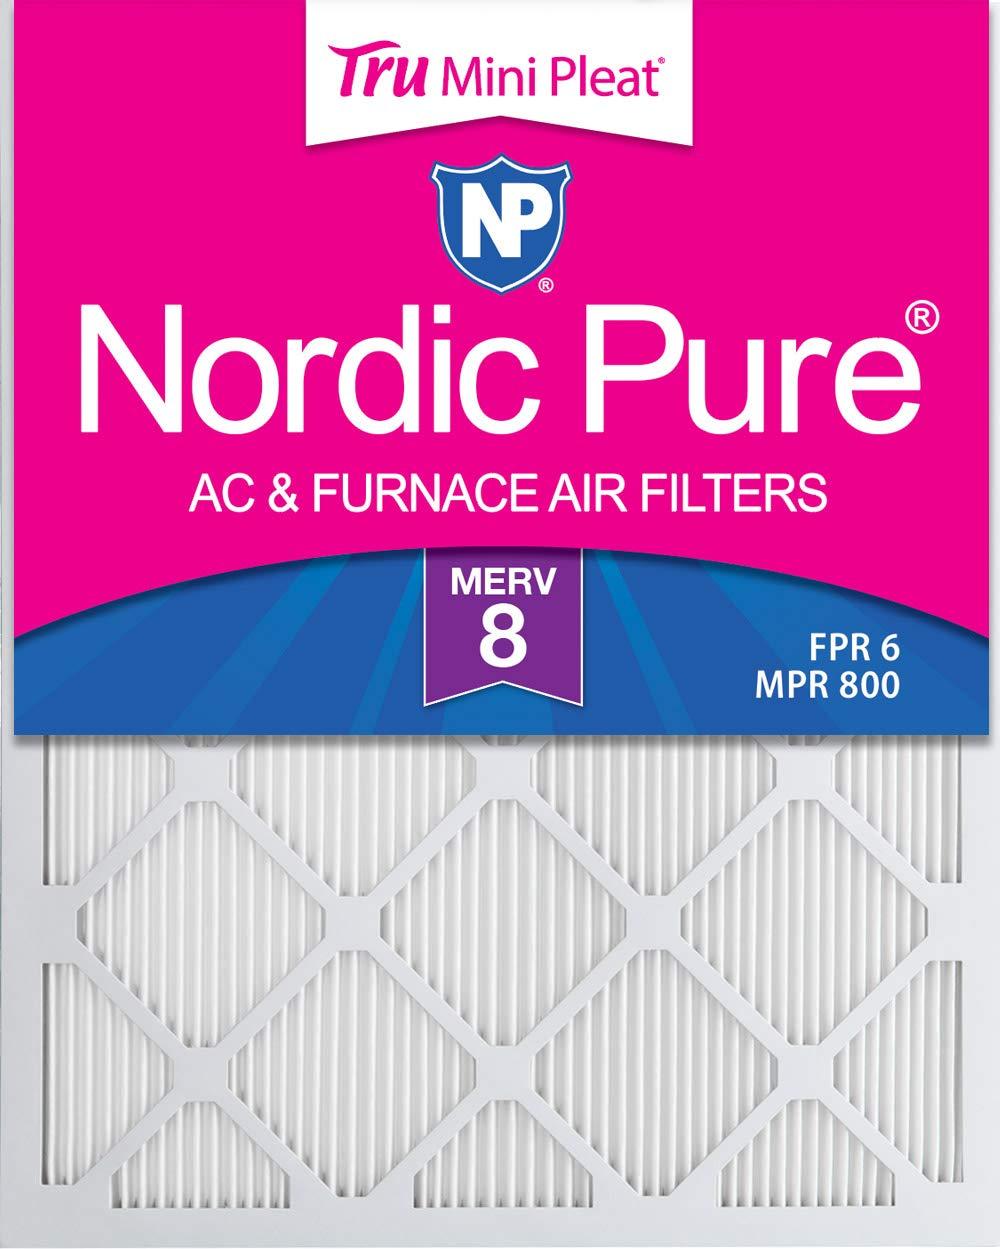 Nordic Pure 20 x 25 x 1 m8minipleat-12 Mini Pleat Merv 8 AC炉エアフィルタ、20インチx 25-inch X 1インチ、12パック   B00MYGJ47I